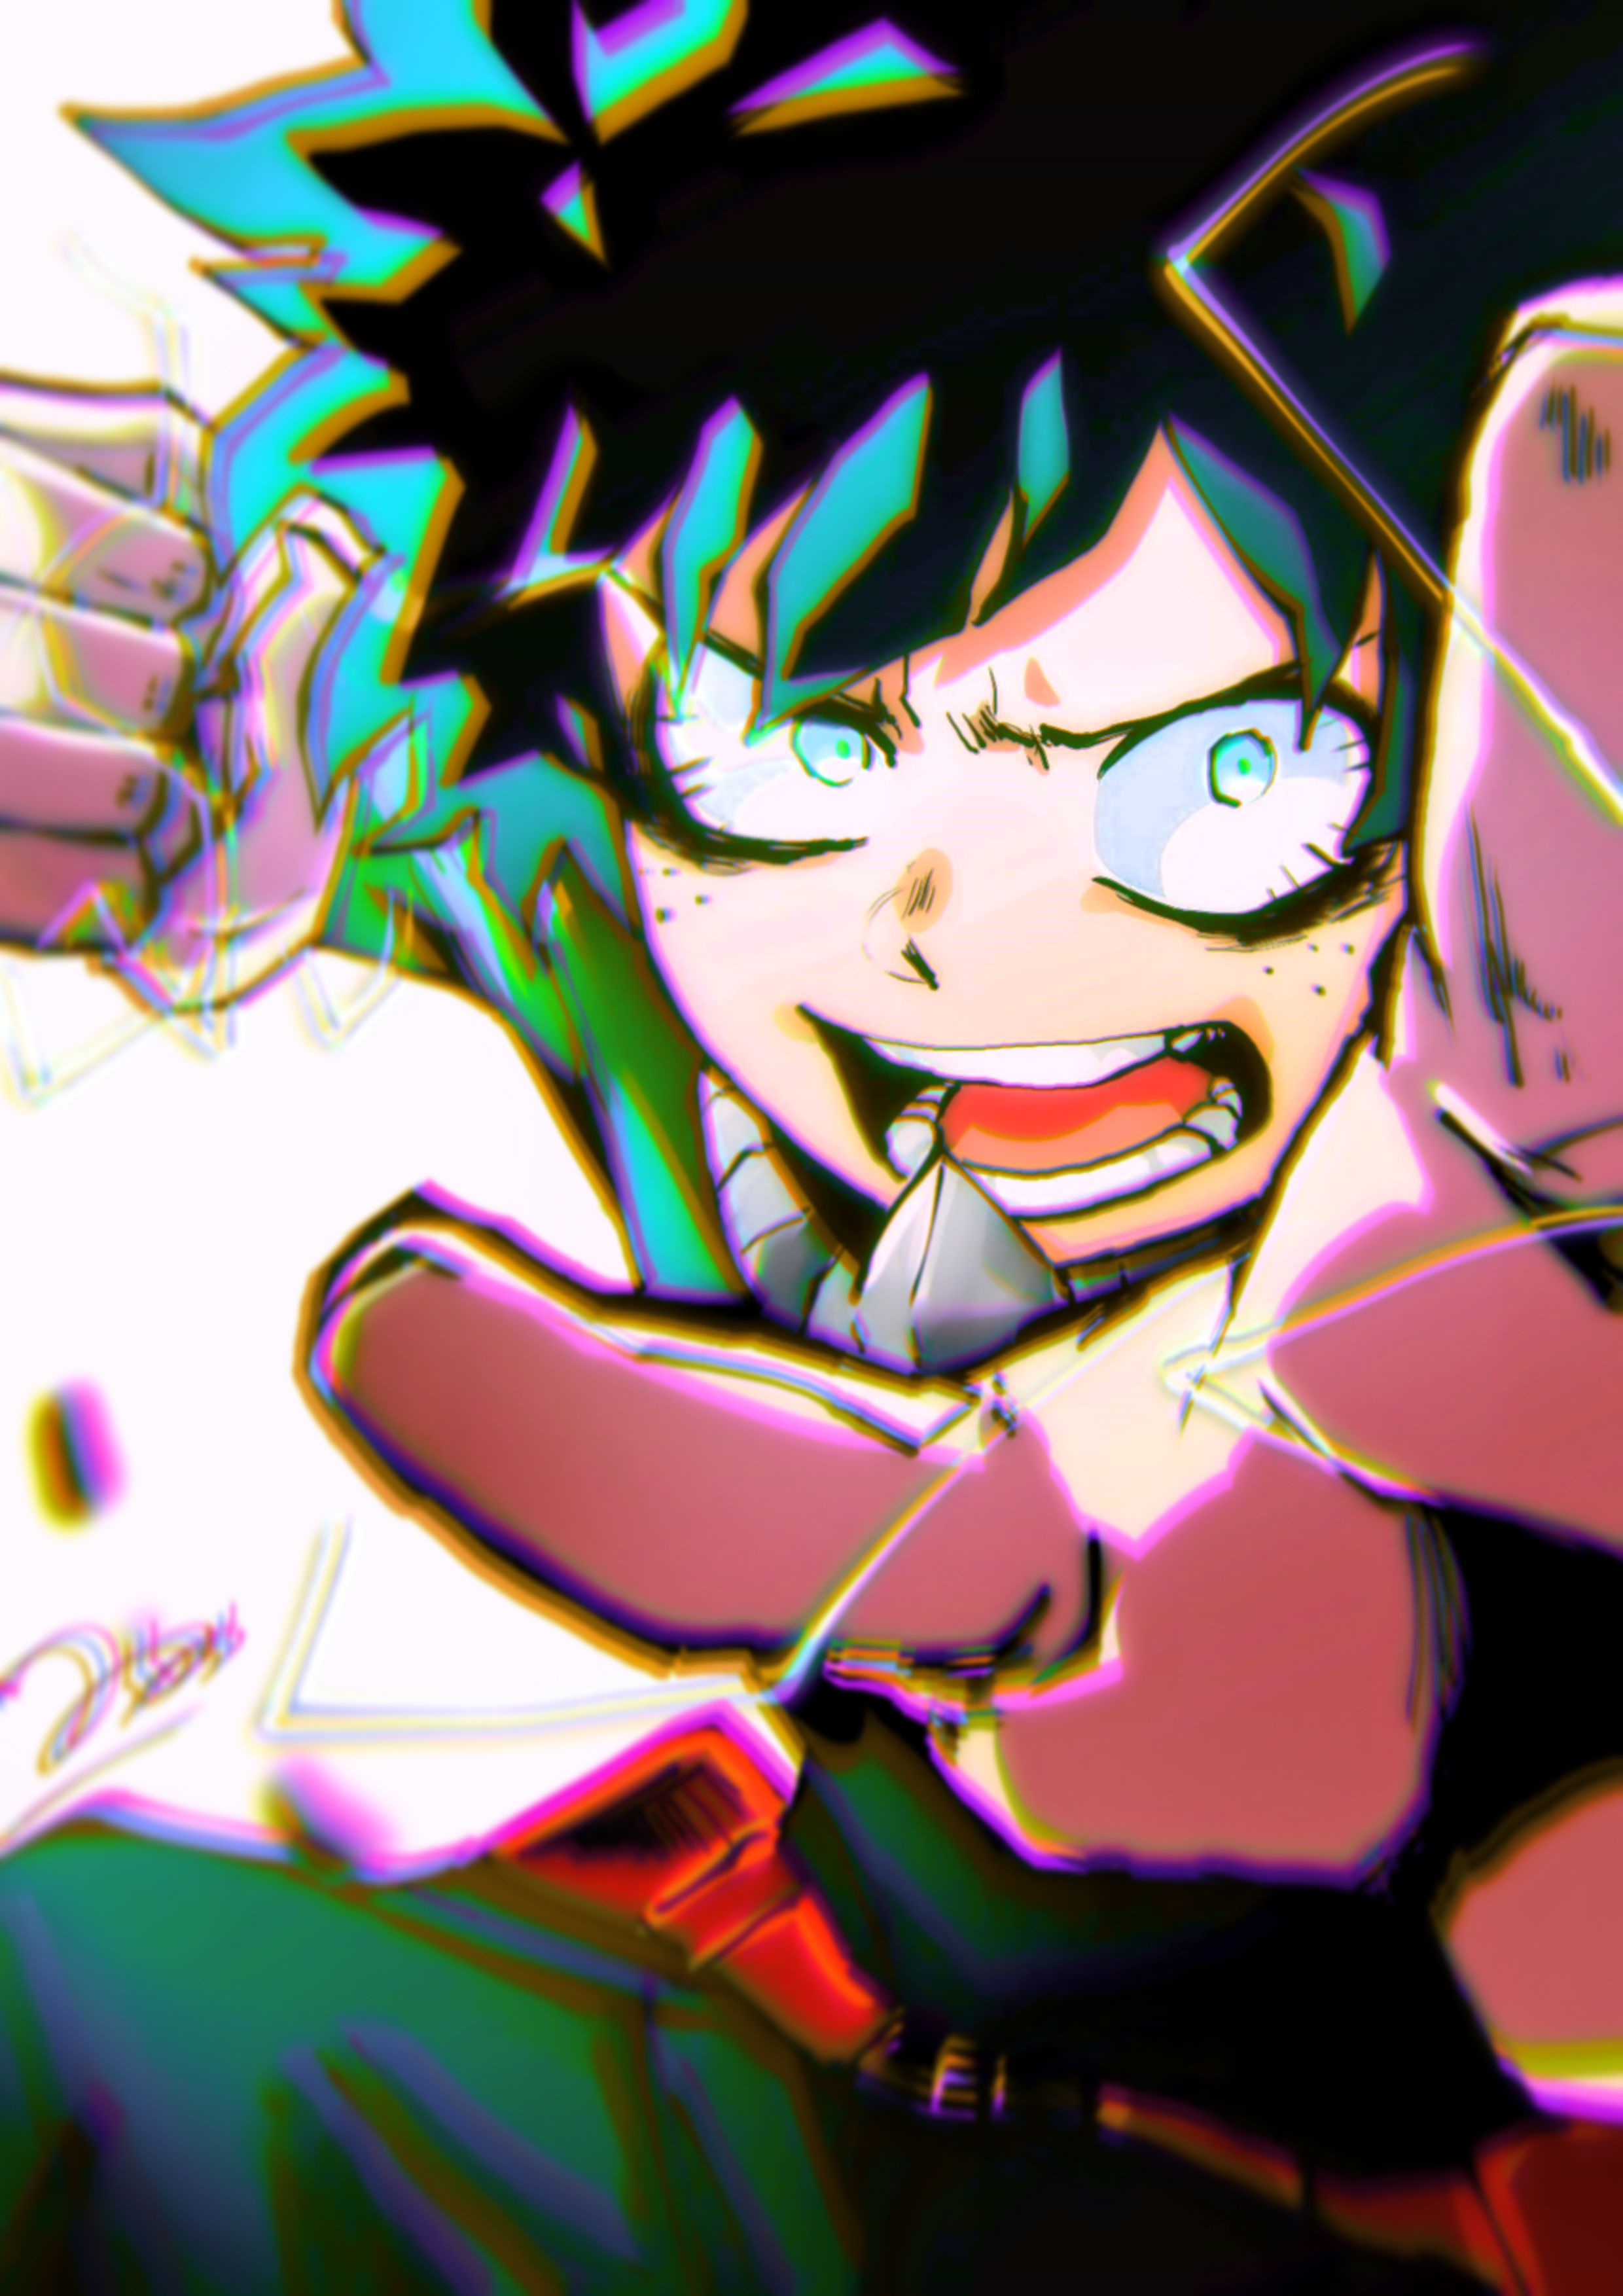 Boku no Hero academia Manga Wallscroll Poster Kunstdrucke Bider Drucke